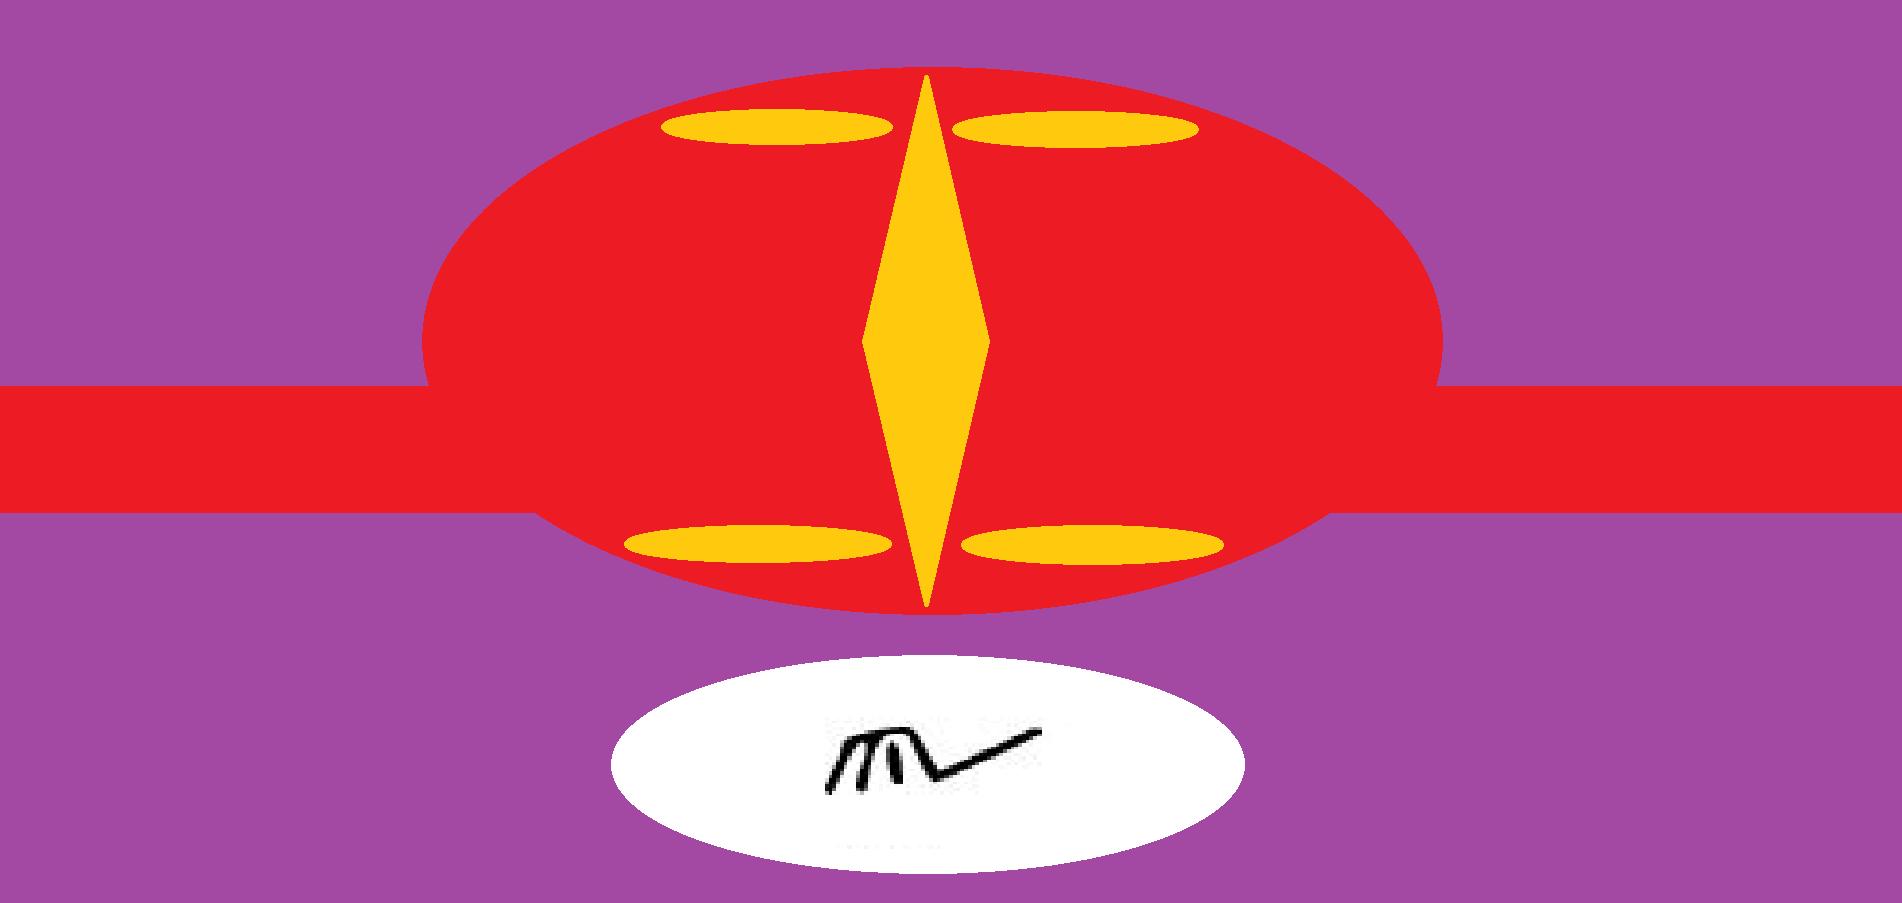 Flag Of Udam 3 Far Cry Primal By Archangelofjustice12 On Deviantart